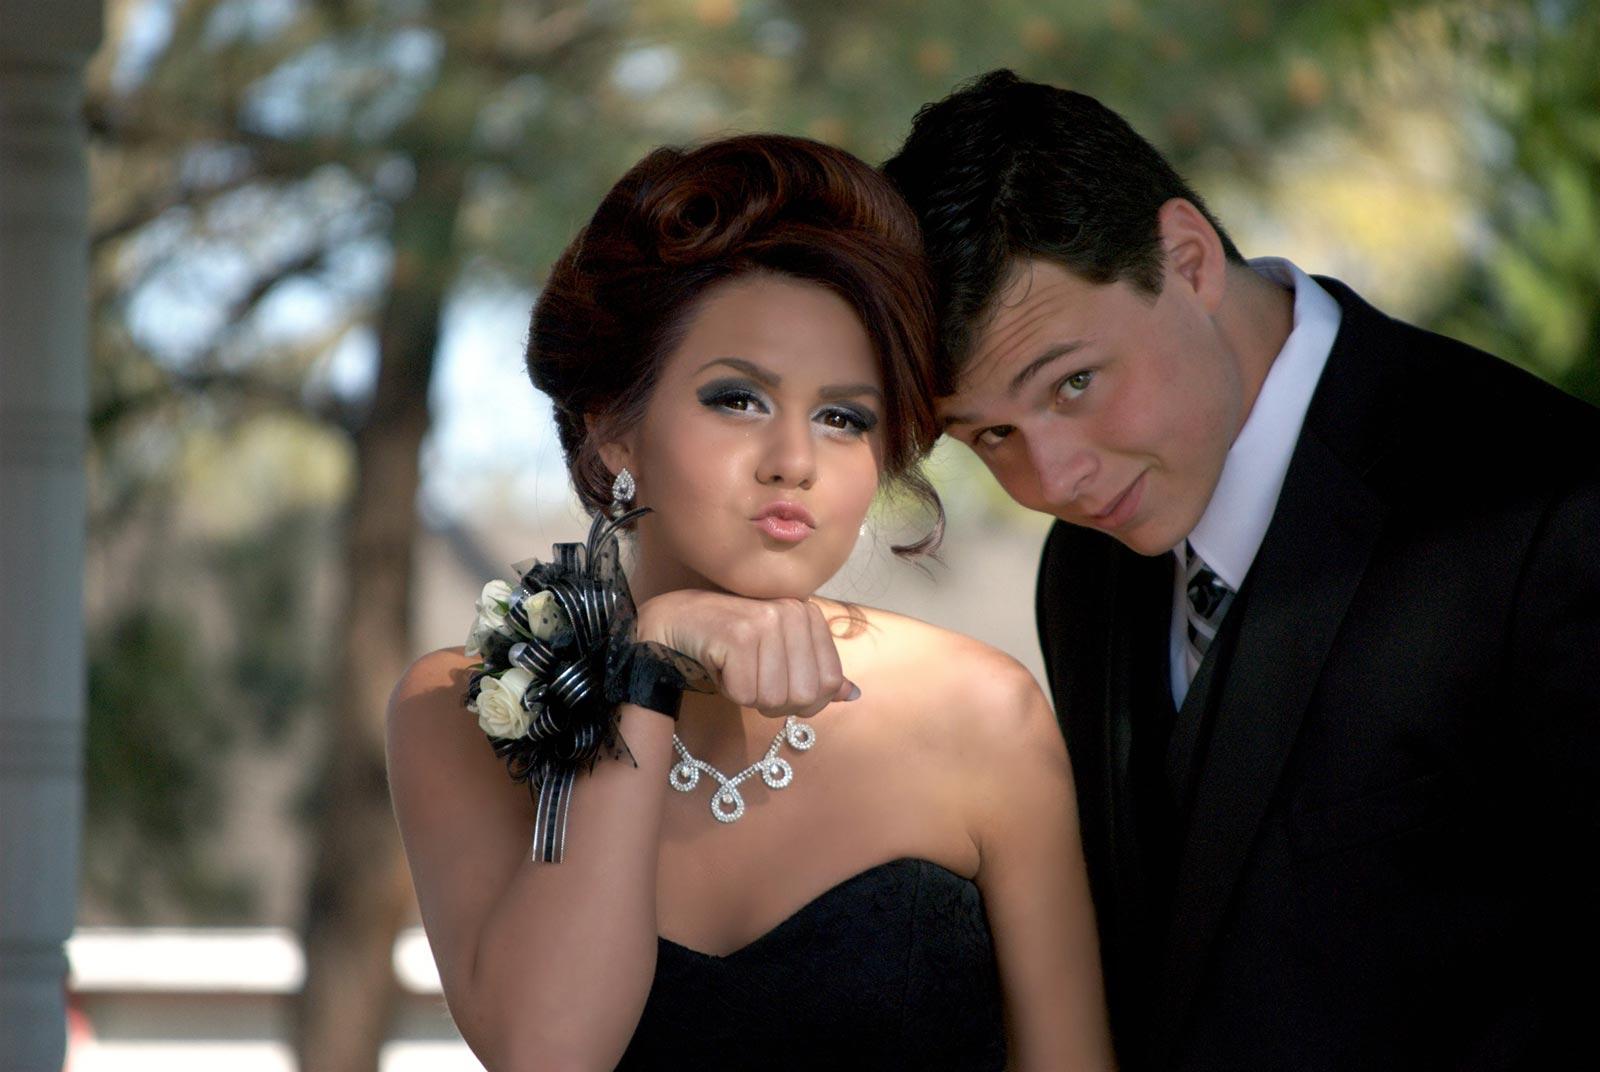 Married Batchelors - Married Batchelorettes